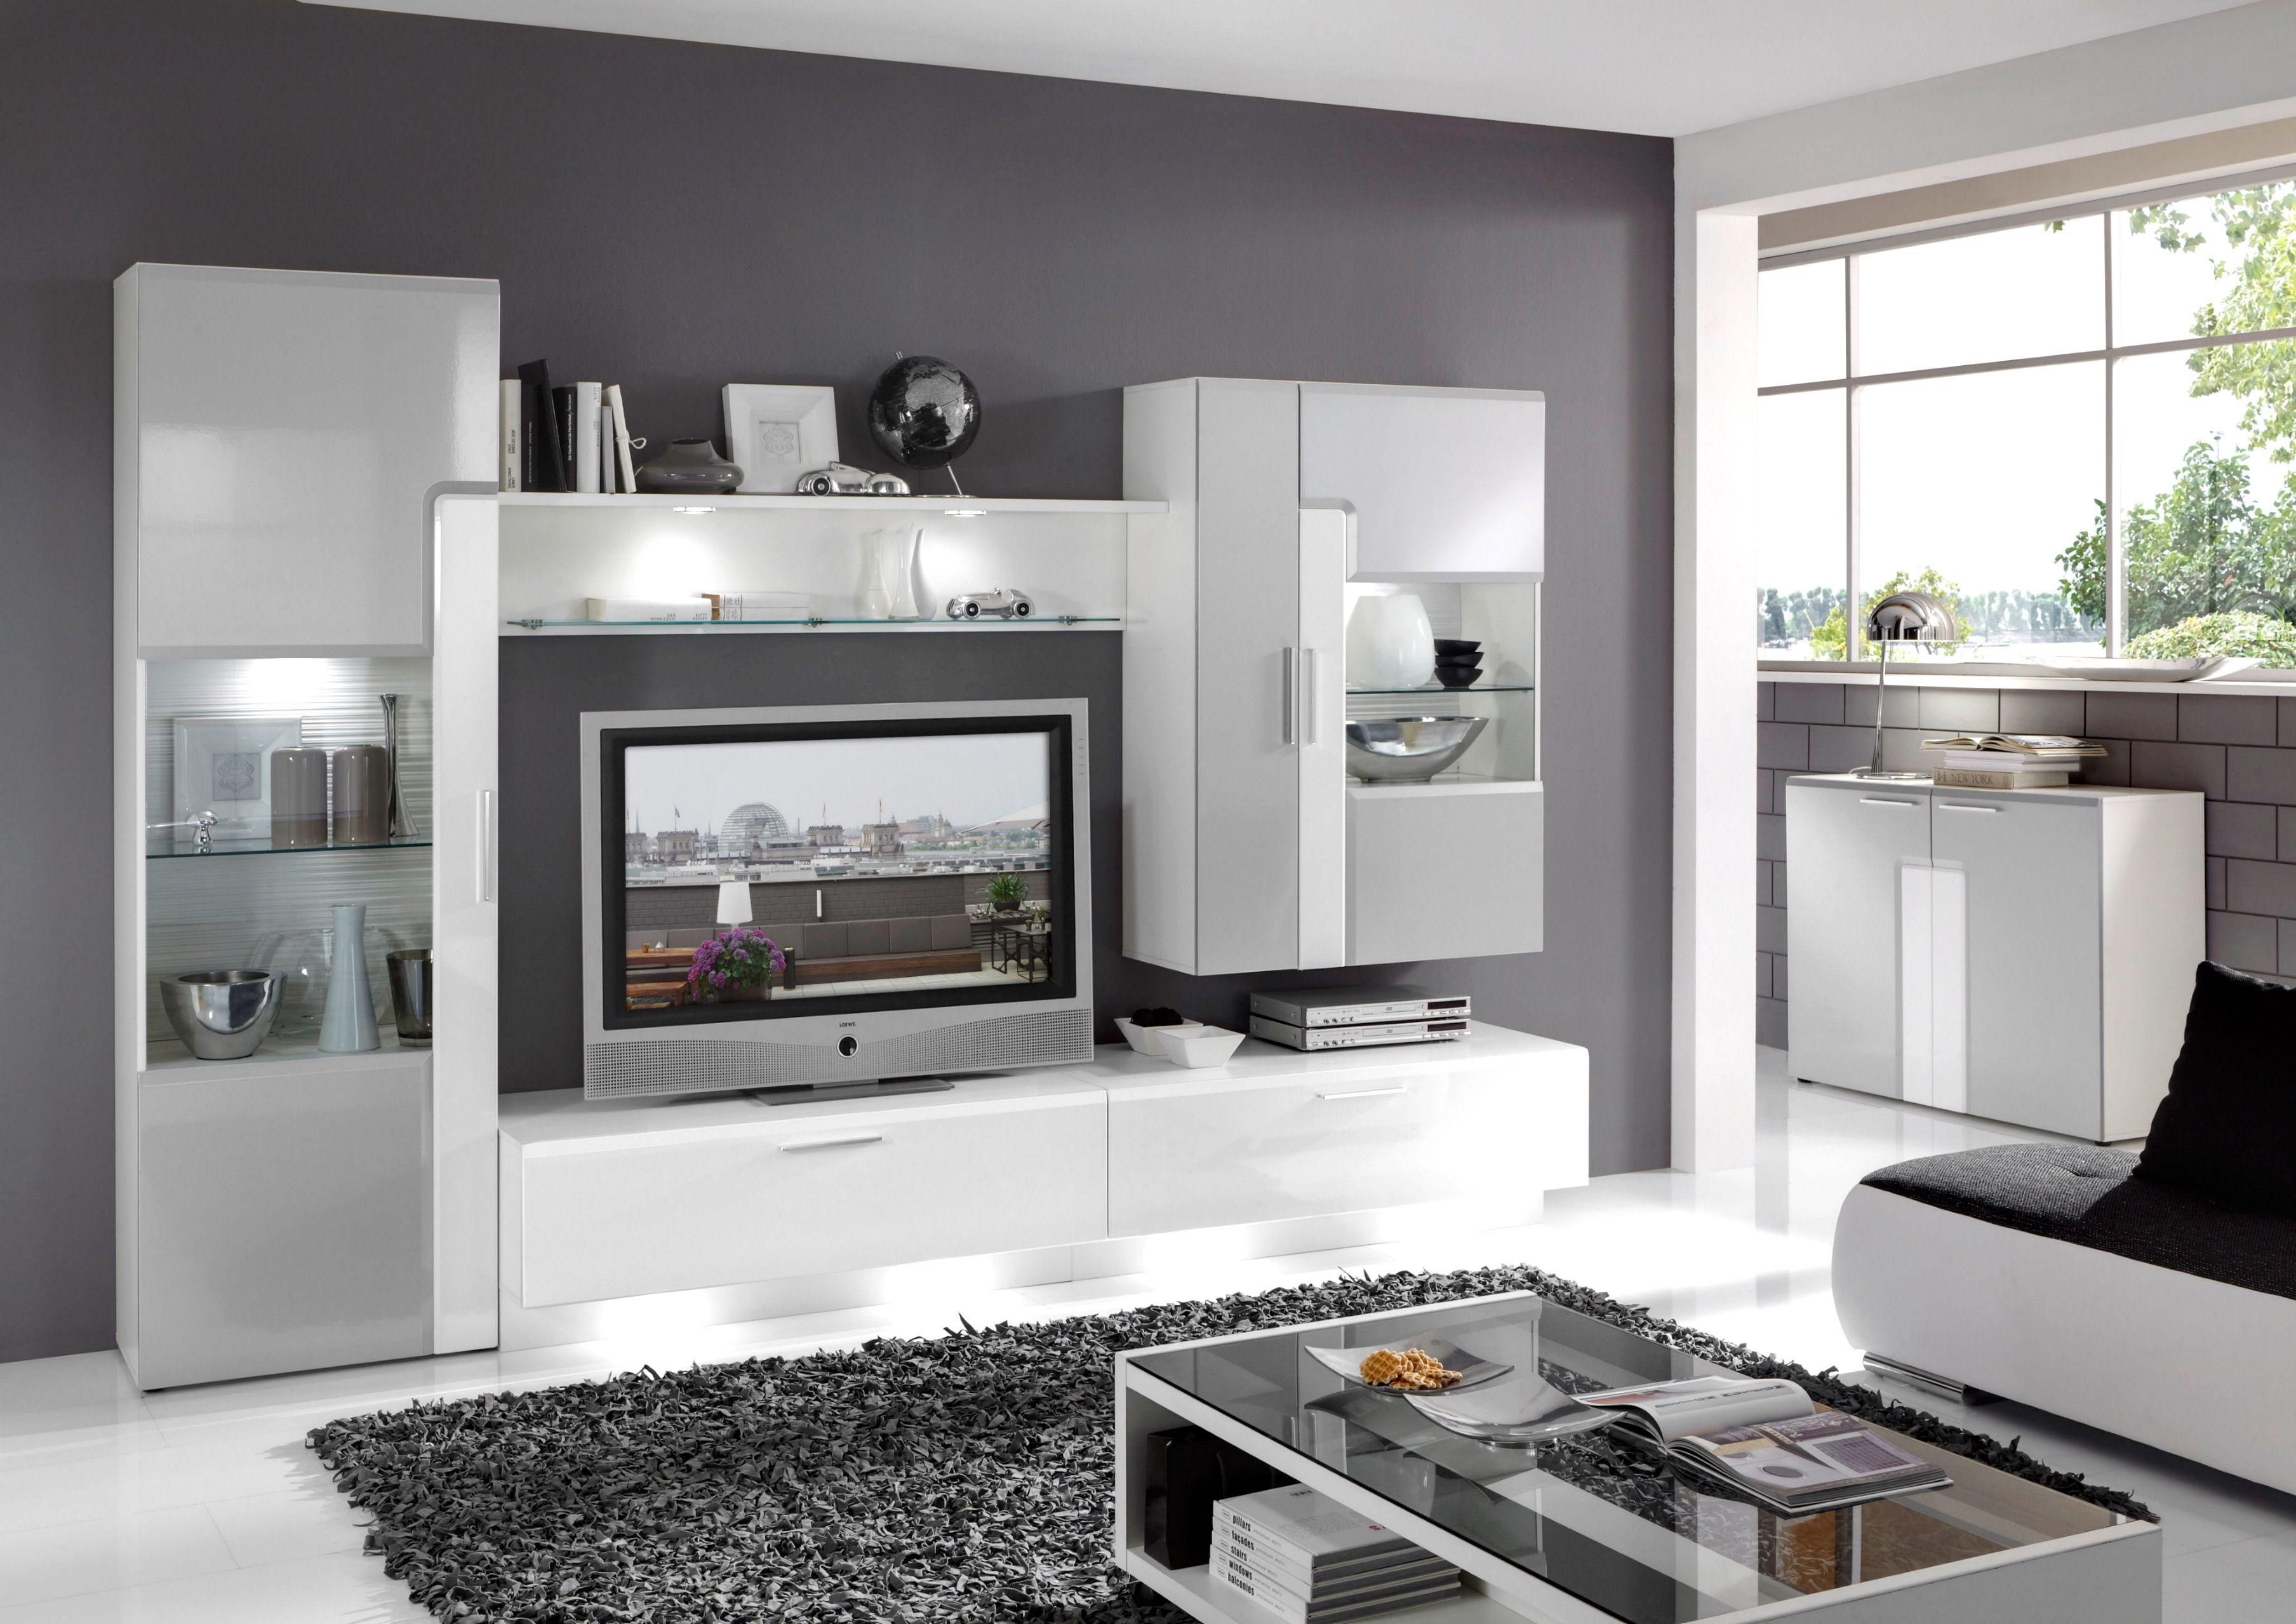 41++ Einrichtungsideen wohnzimmer grau weiss ideen